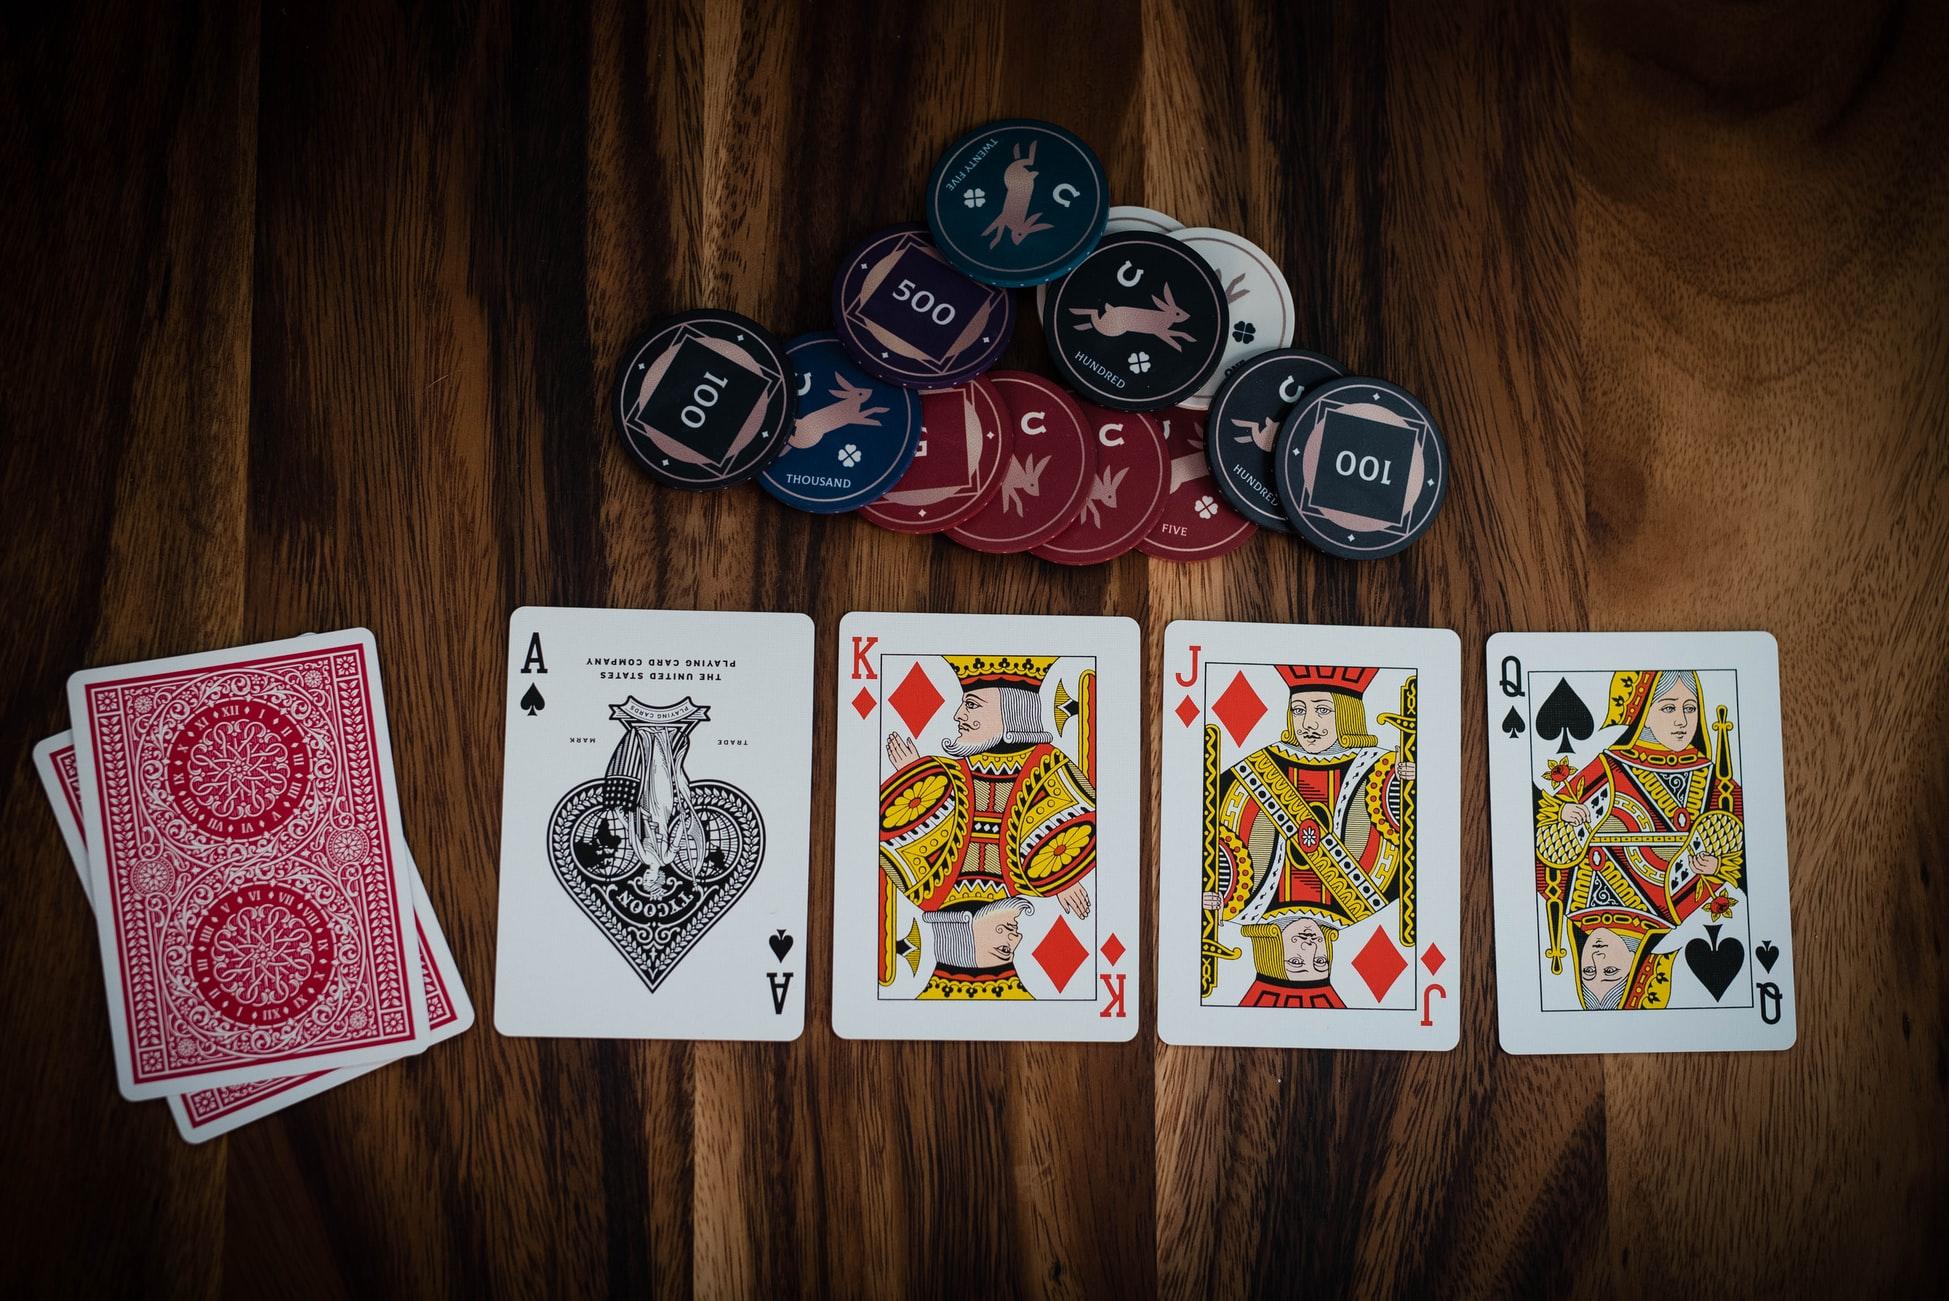 Versla de poker bot